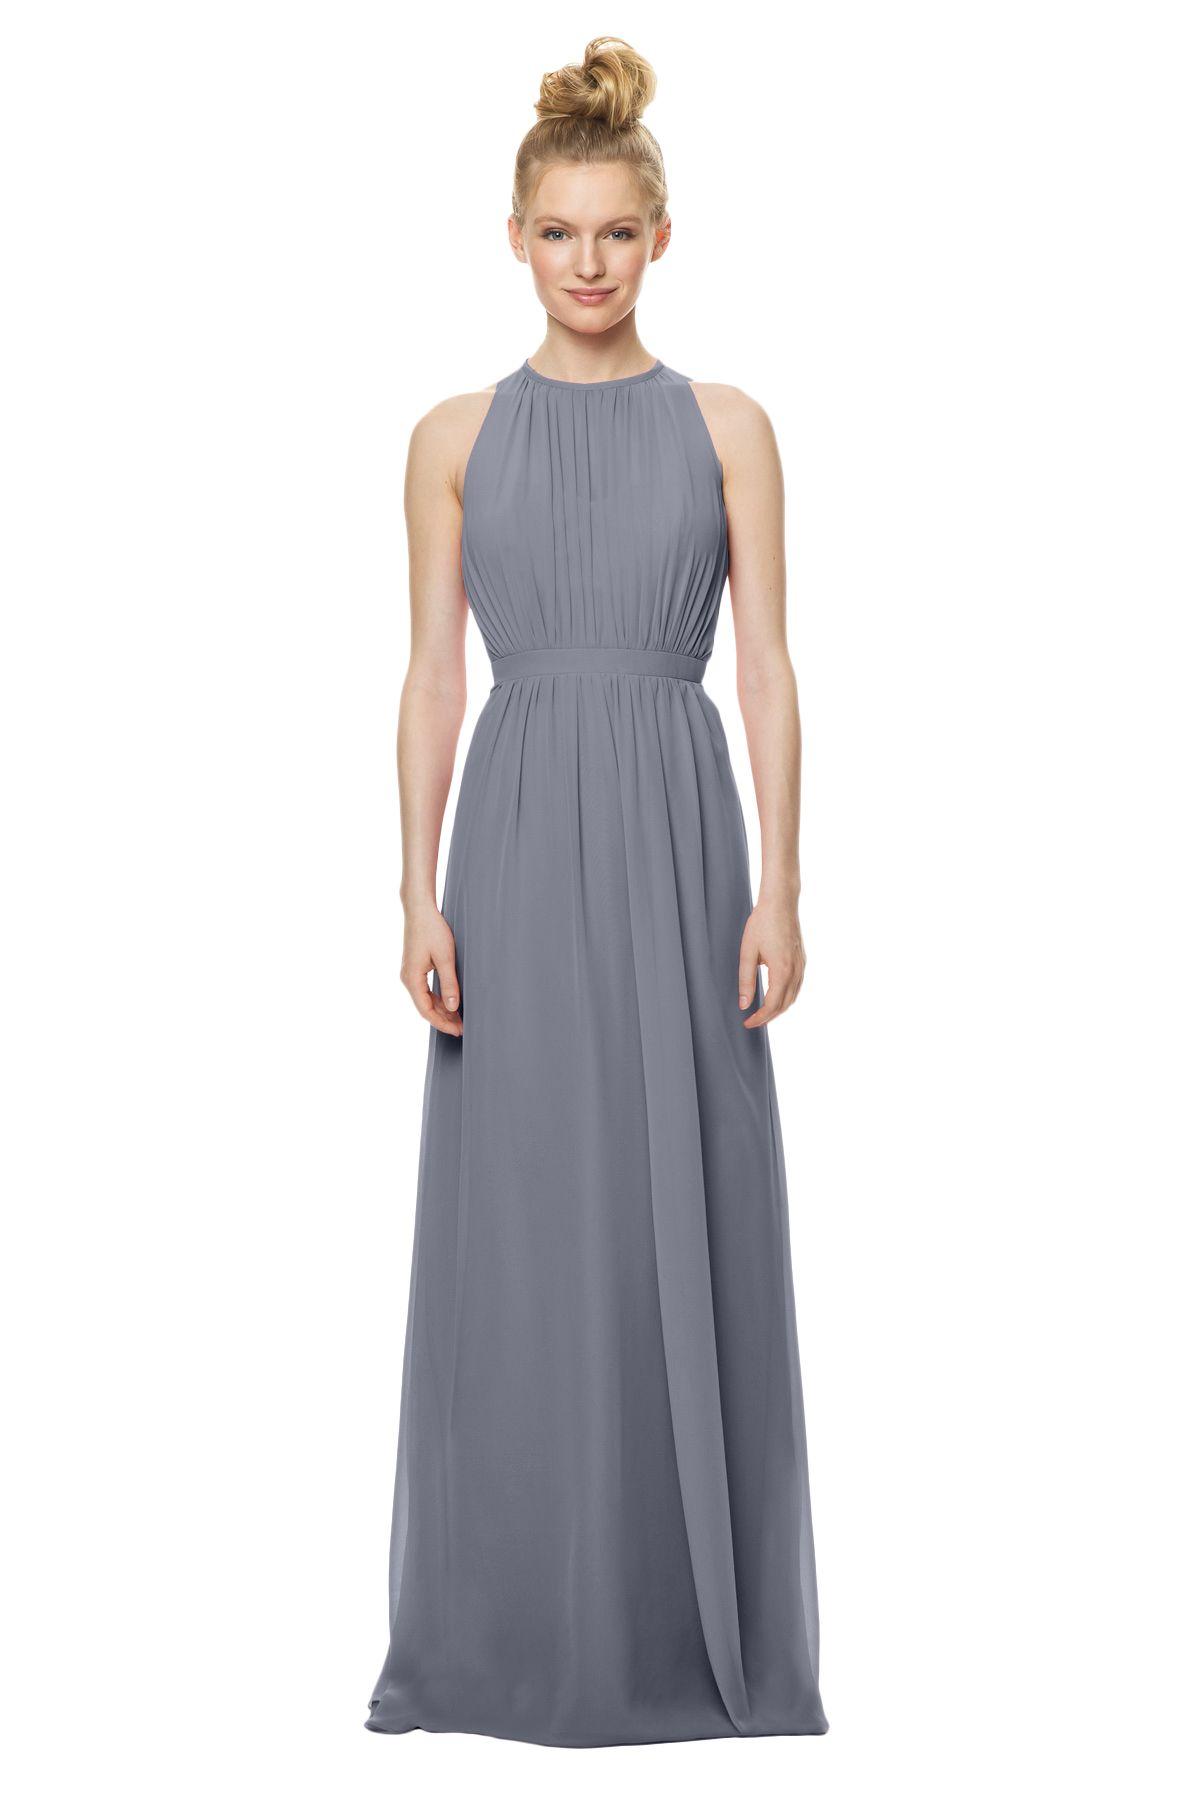 Shop Bari Jay Bridesmaid Dress - 1471 in Bella Chiffon at Weddington ...